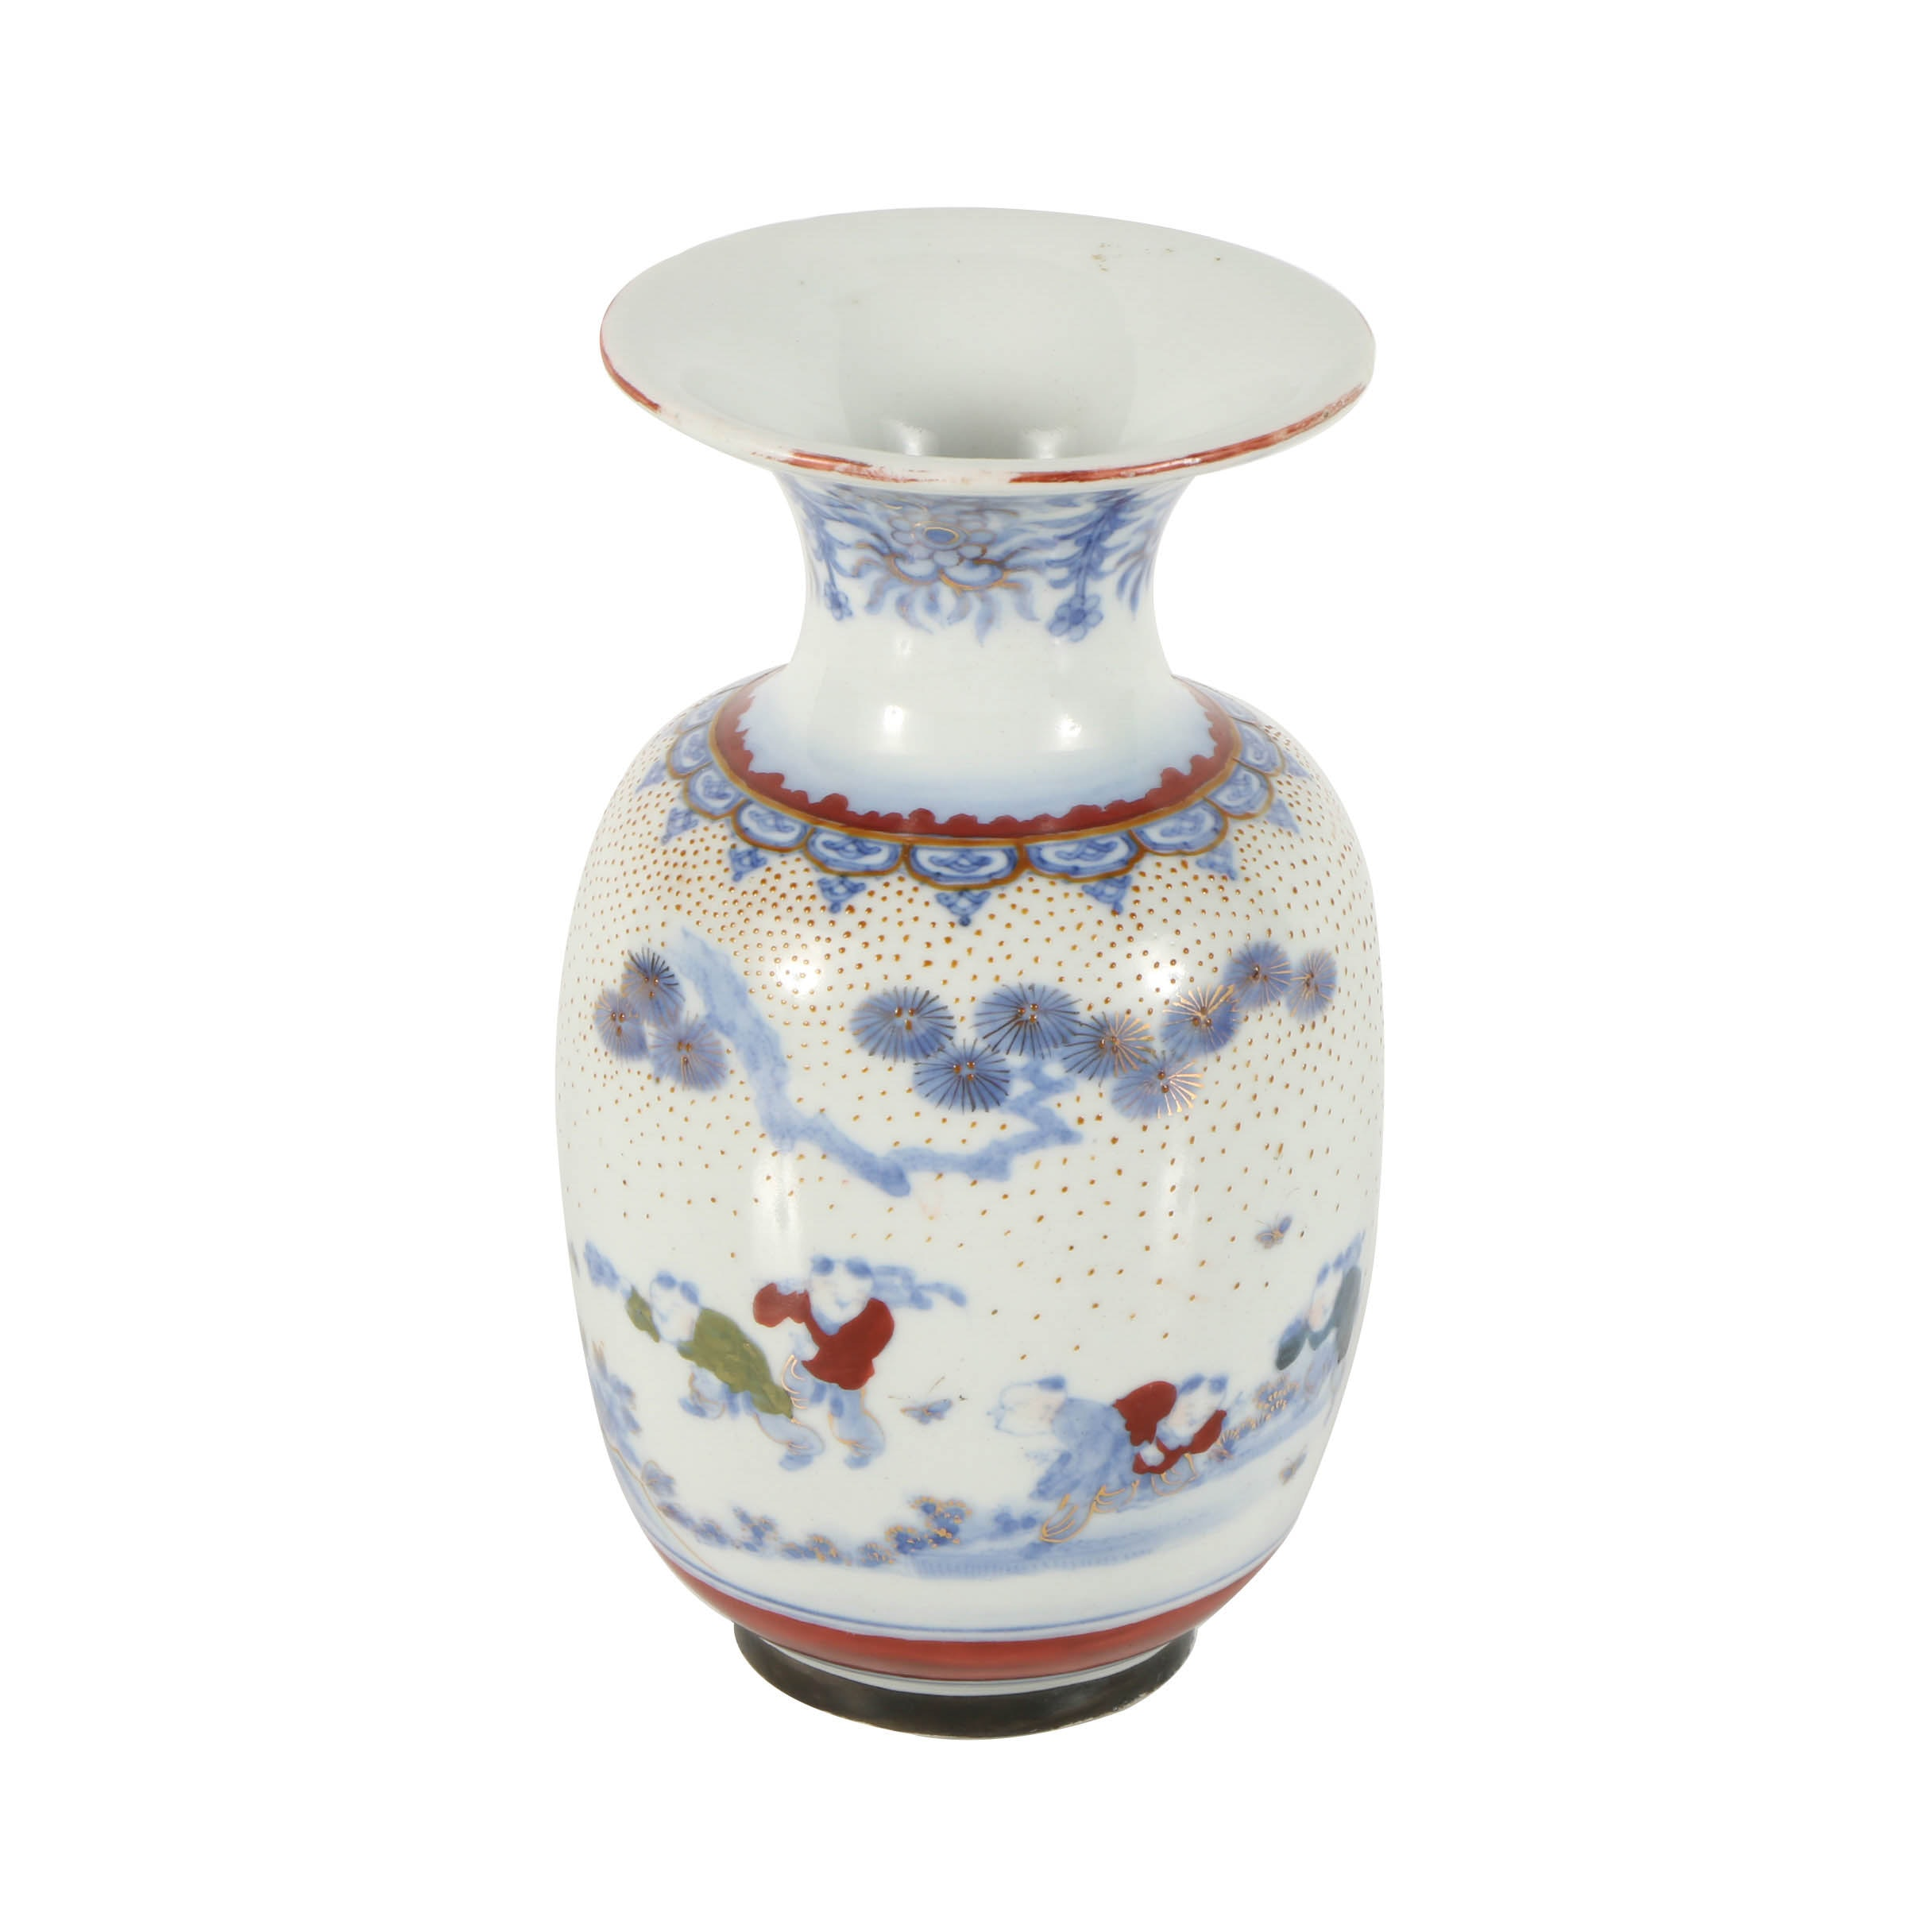 19th Century Japanese Hirado Vase